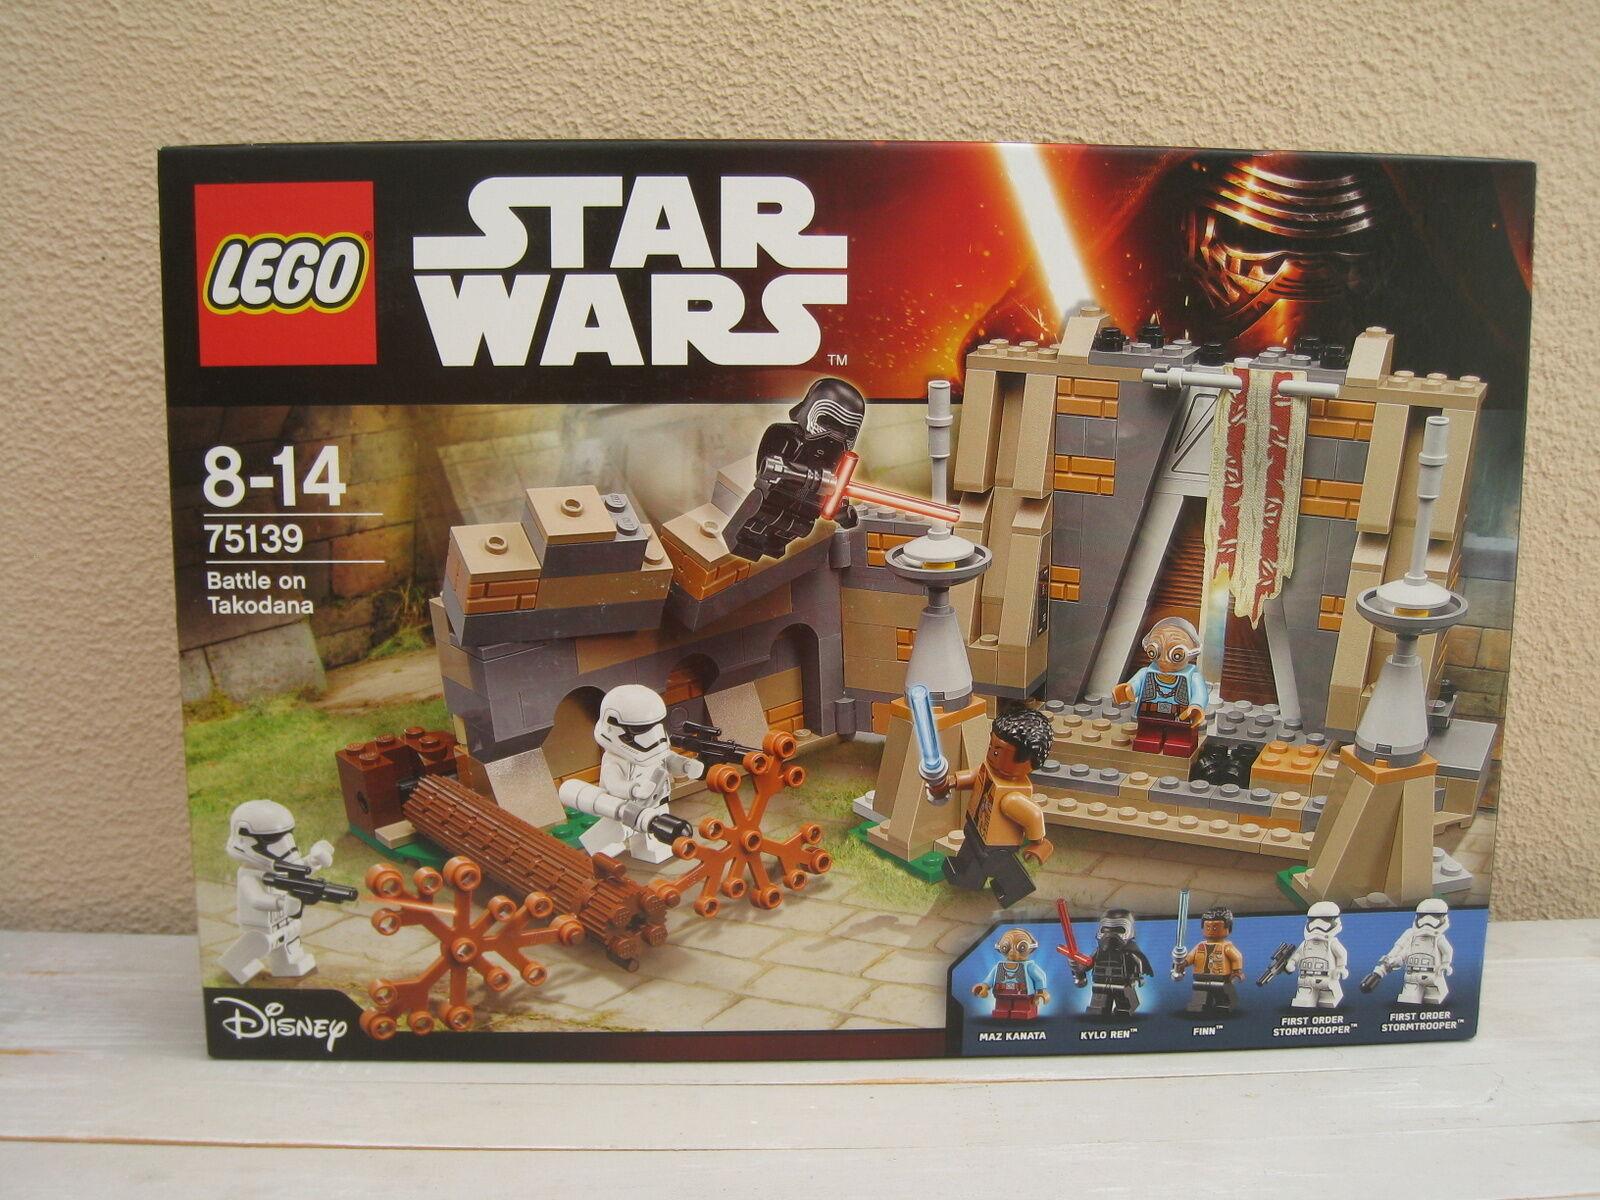 Lego Star Wars La BaGröße de Takodana - 75139 75139 75139 - Neuf et scellé Sealed 90c853